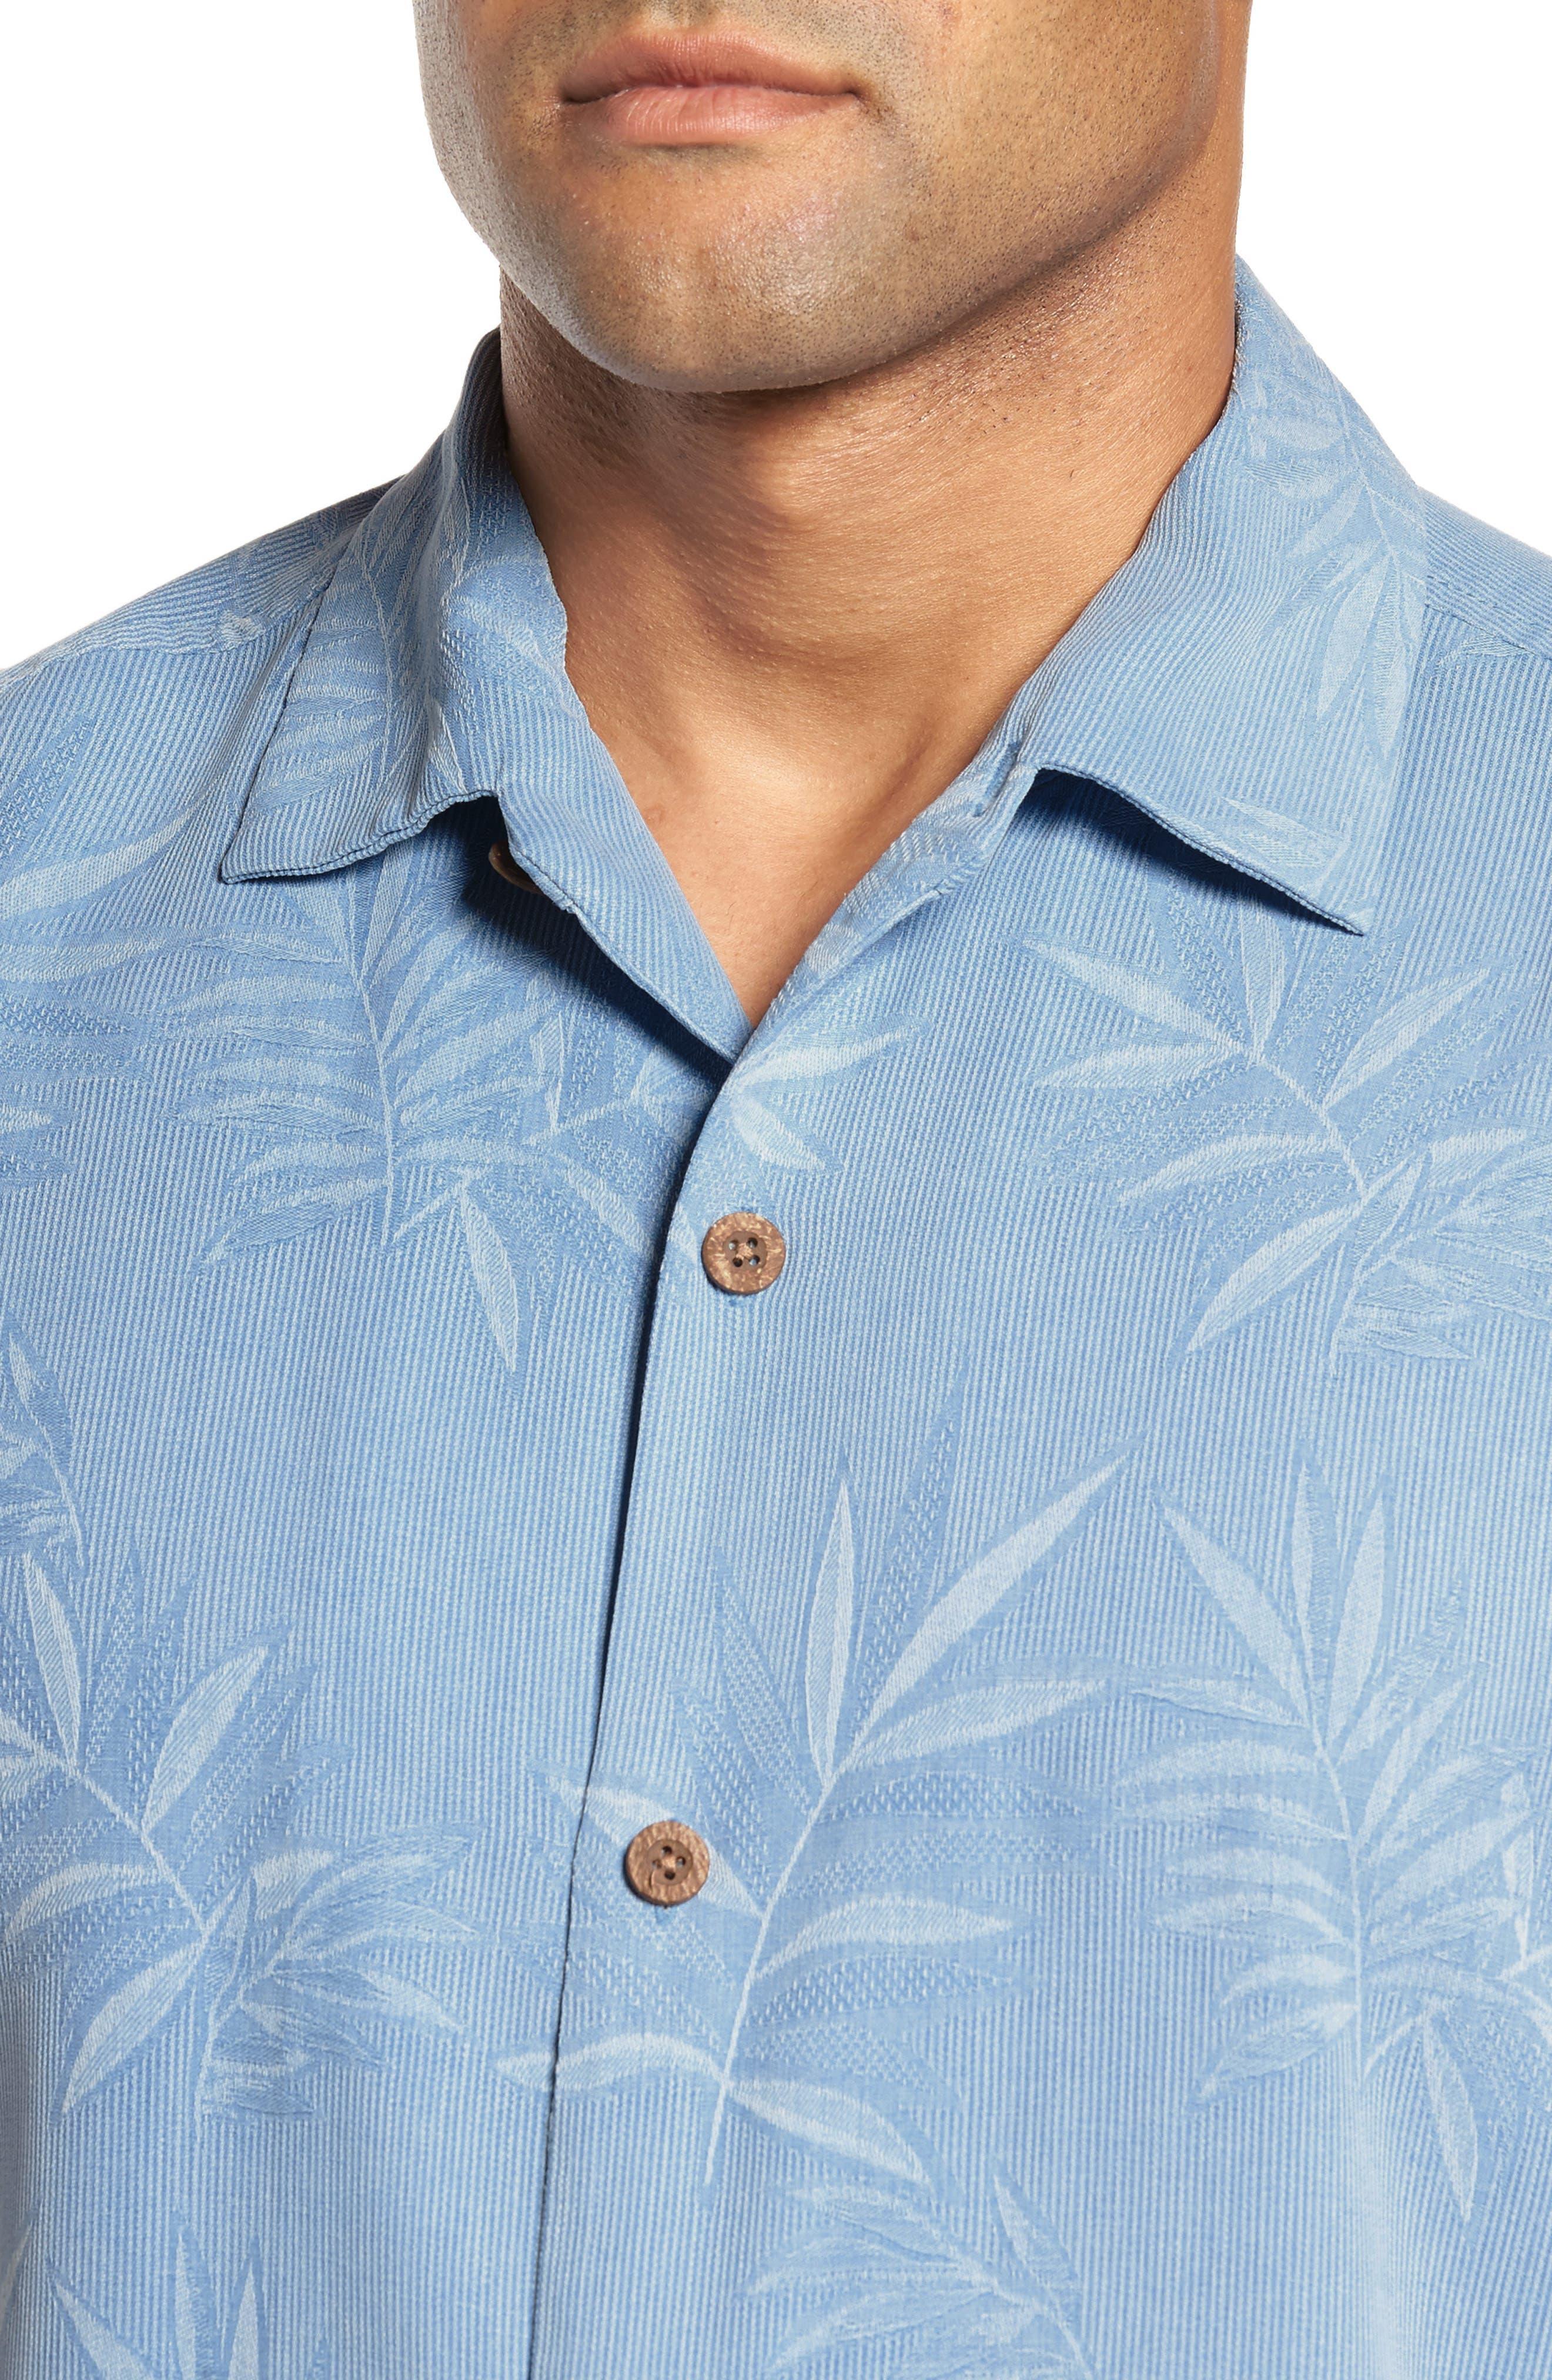 TOMMY BAHAMA,                             Luau Floral Silk Shirt,                             Alternate thumbnail 4, color,                             408